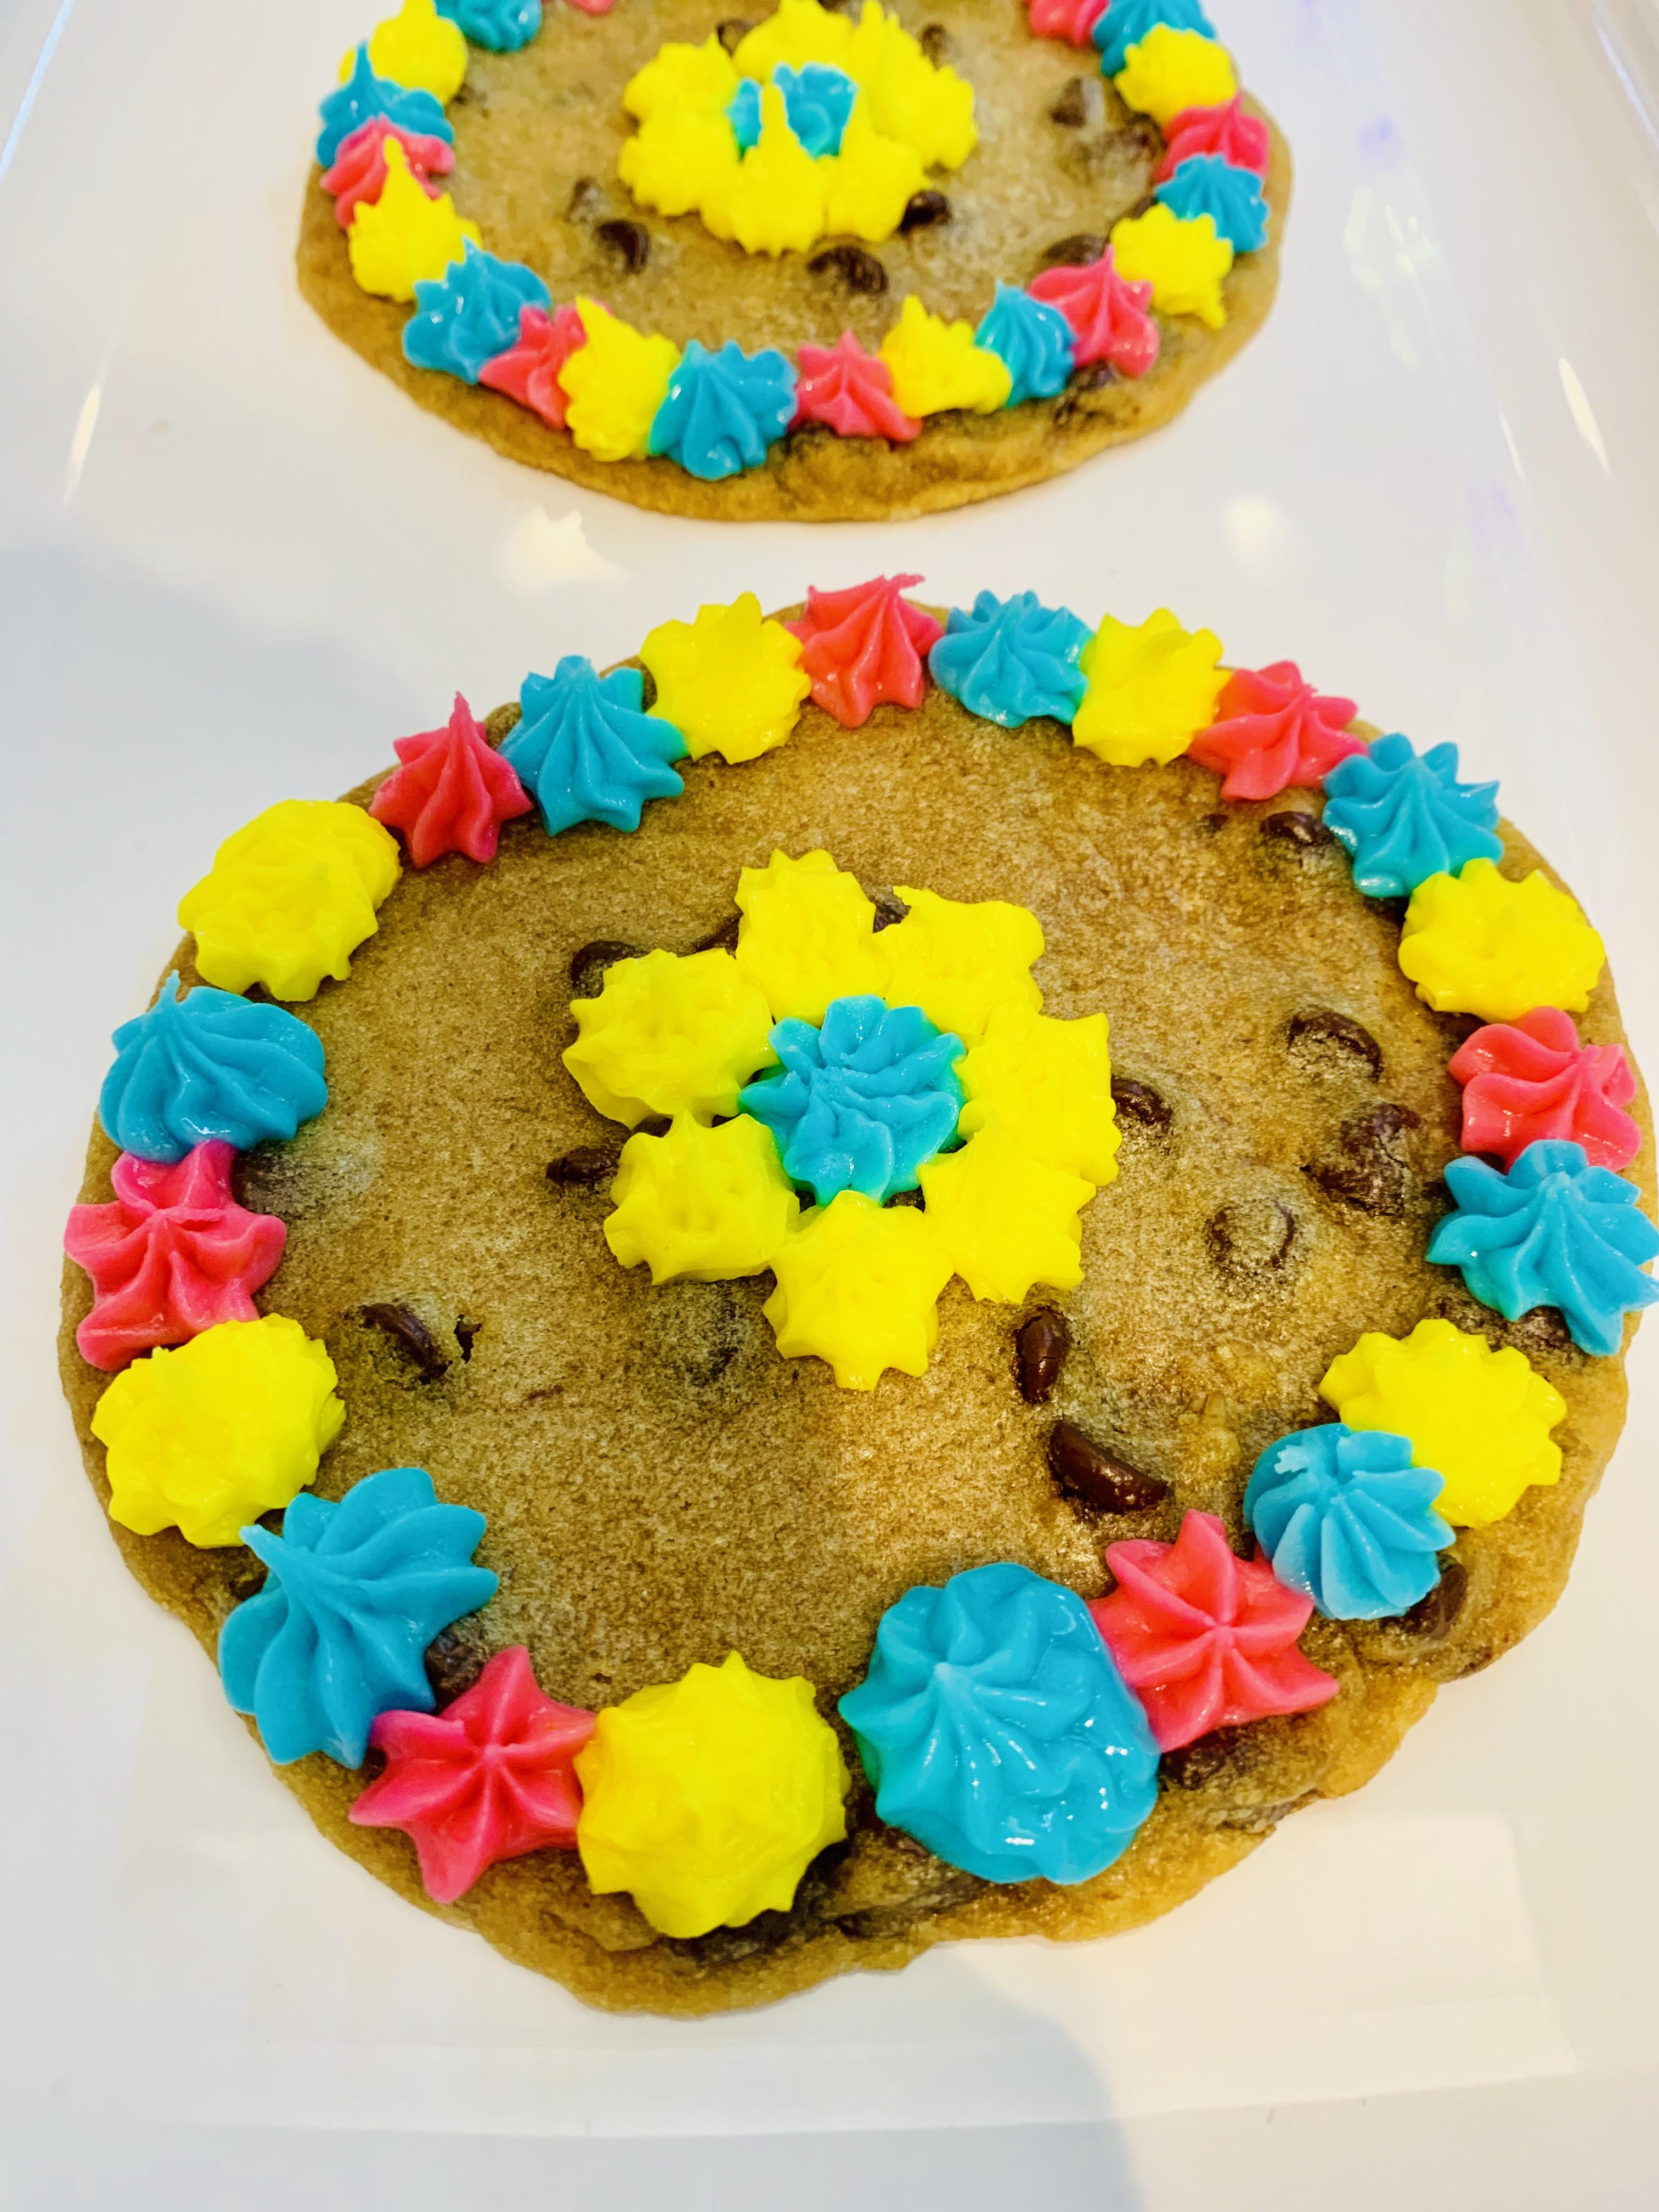 https://0201.nccdn.net/4_2/000/000/008/486/Mini-Cookie-Cake.jpg